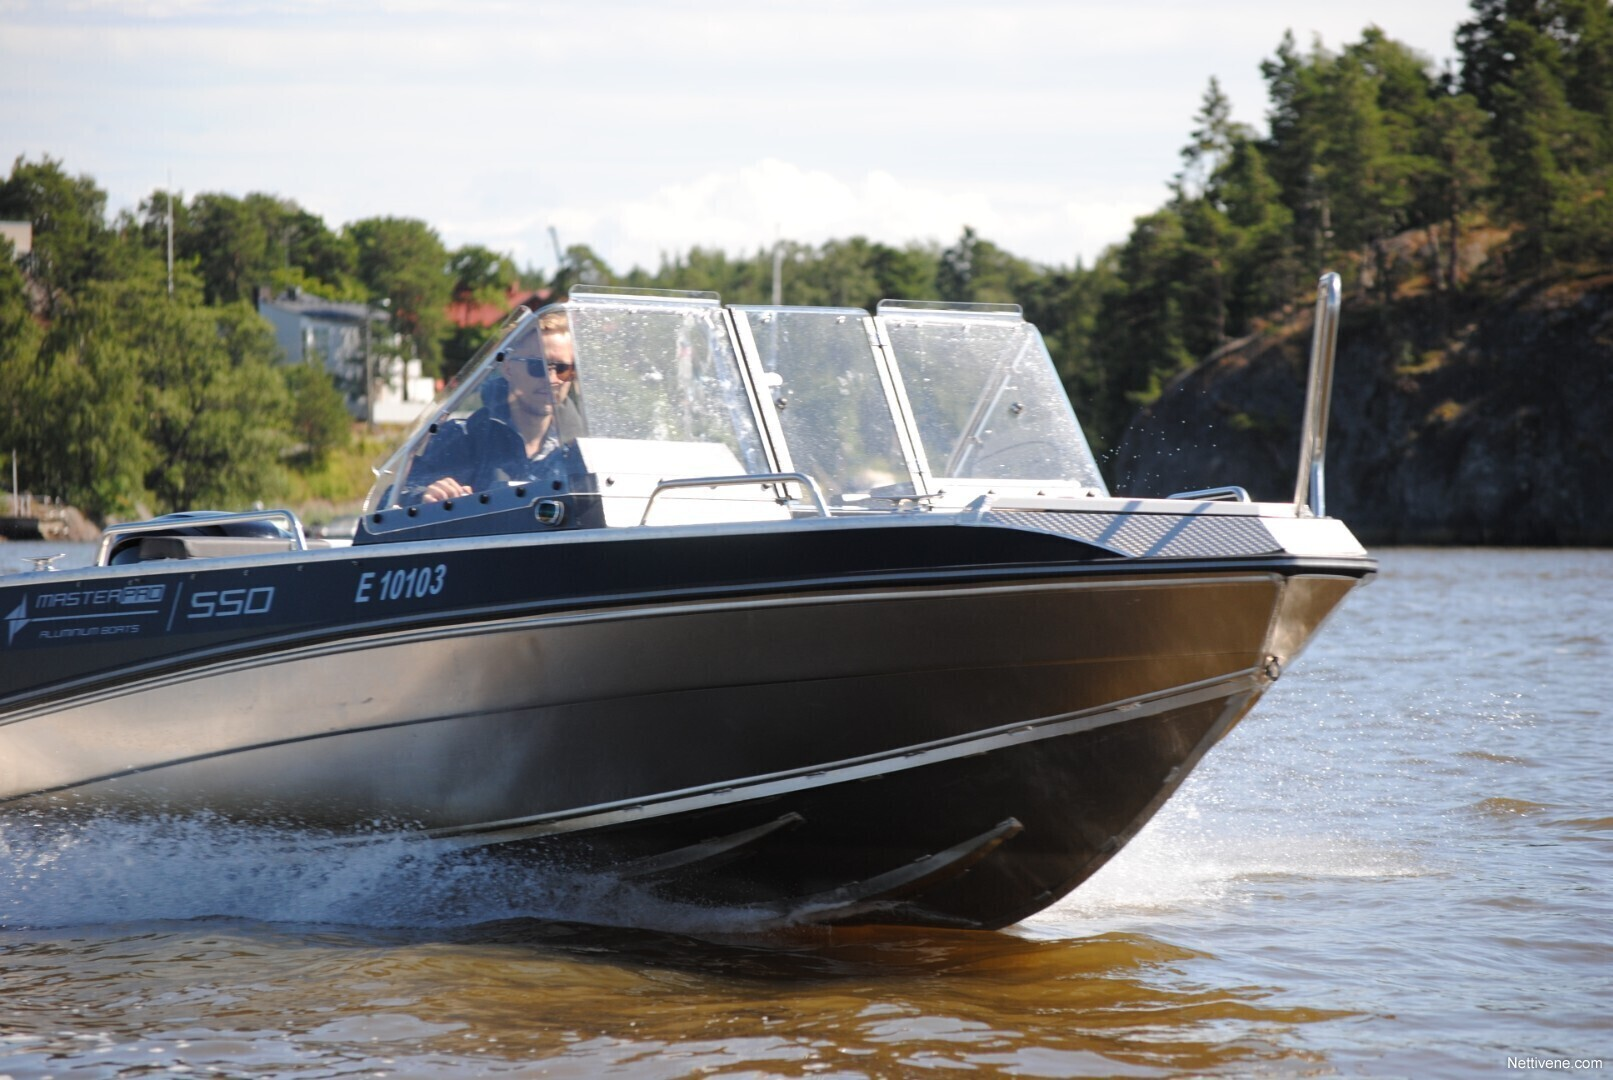 Moottorivene Master Pro 550 + F80